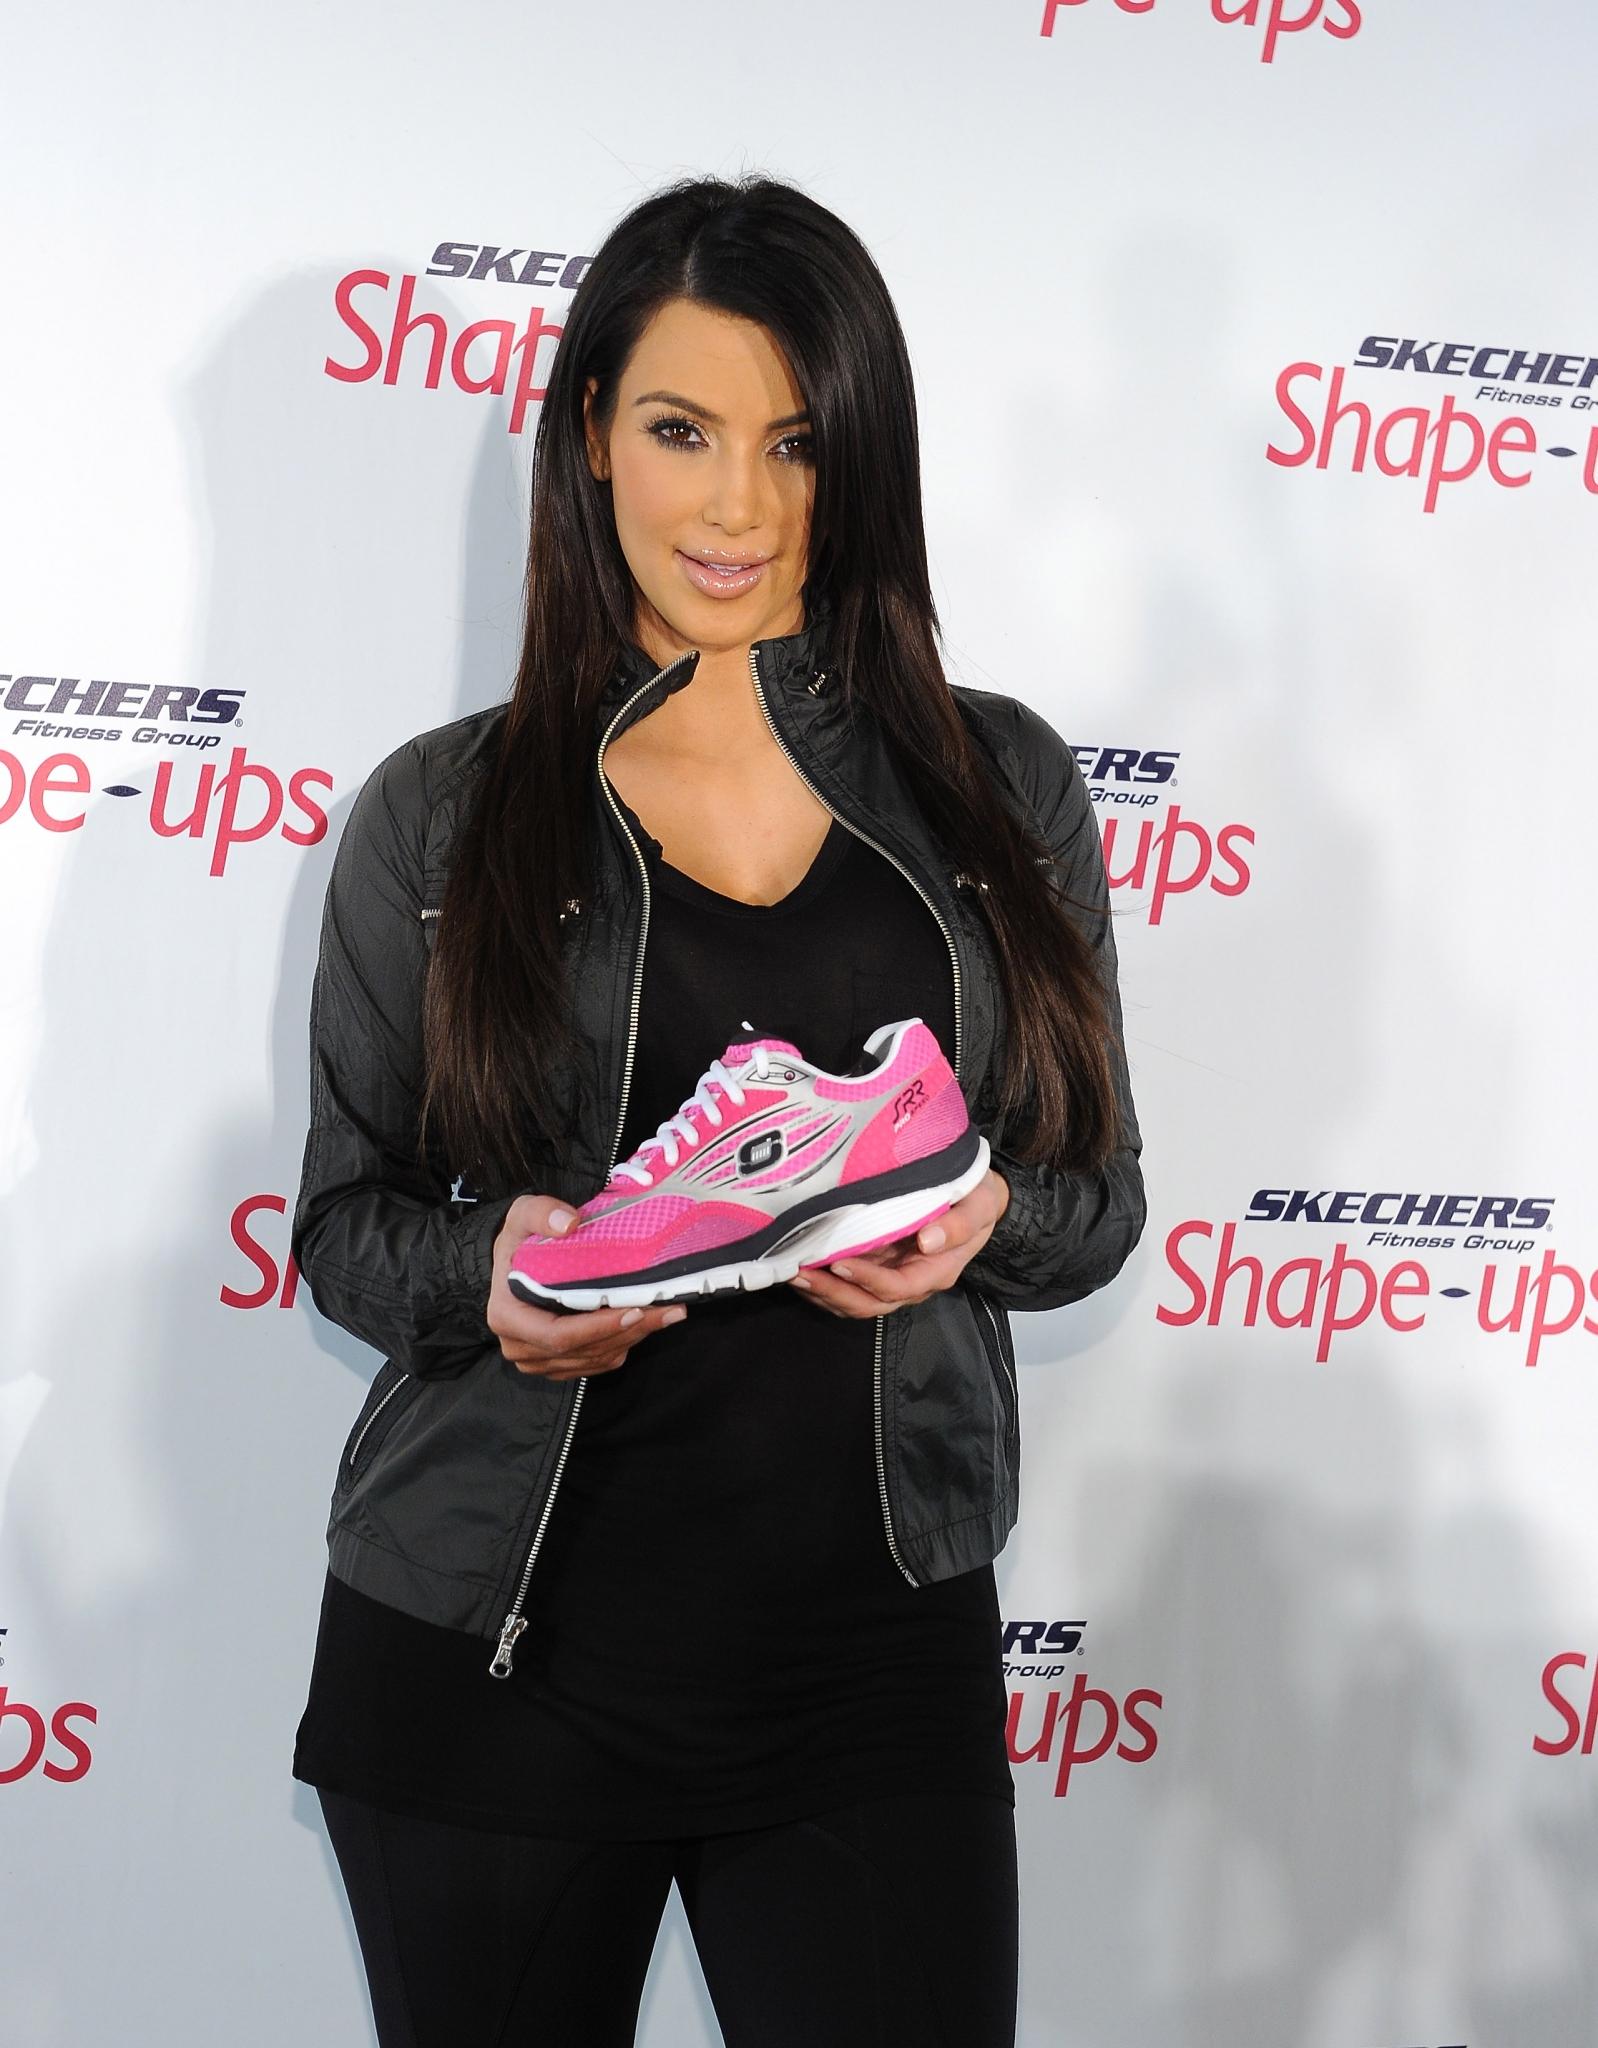 Federal Report: Skechers Shape Ups Don't Work Kim